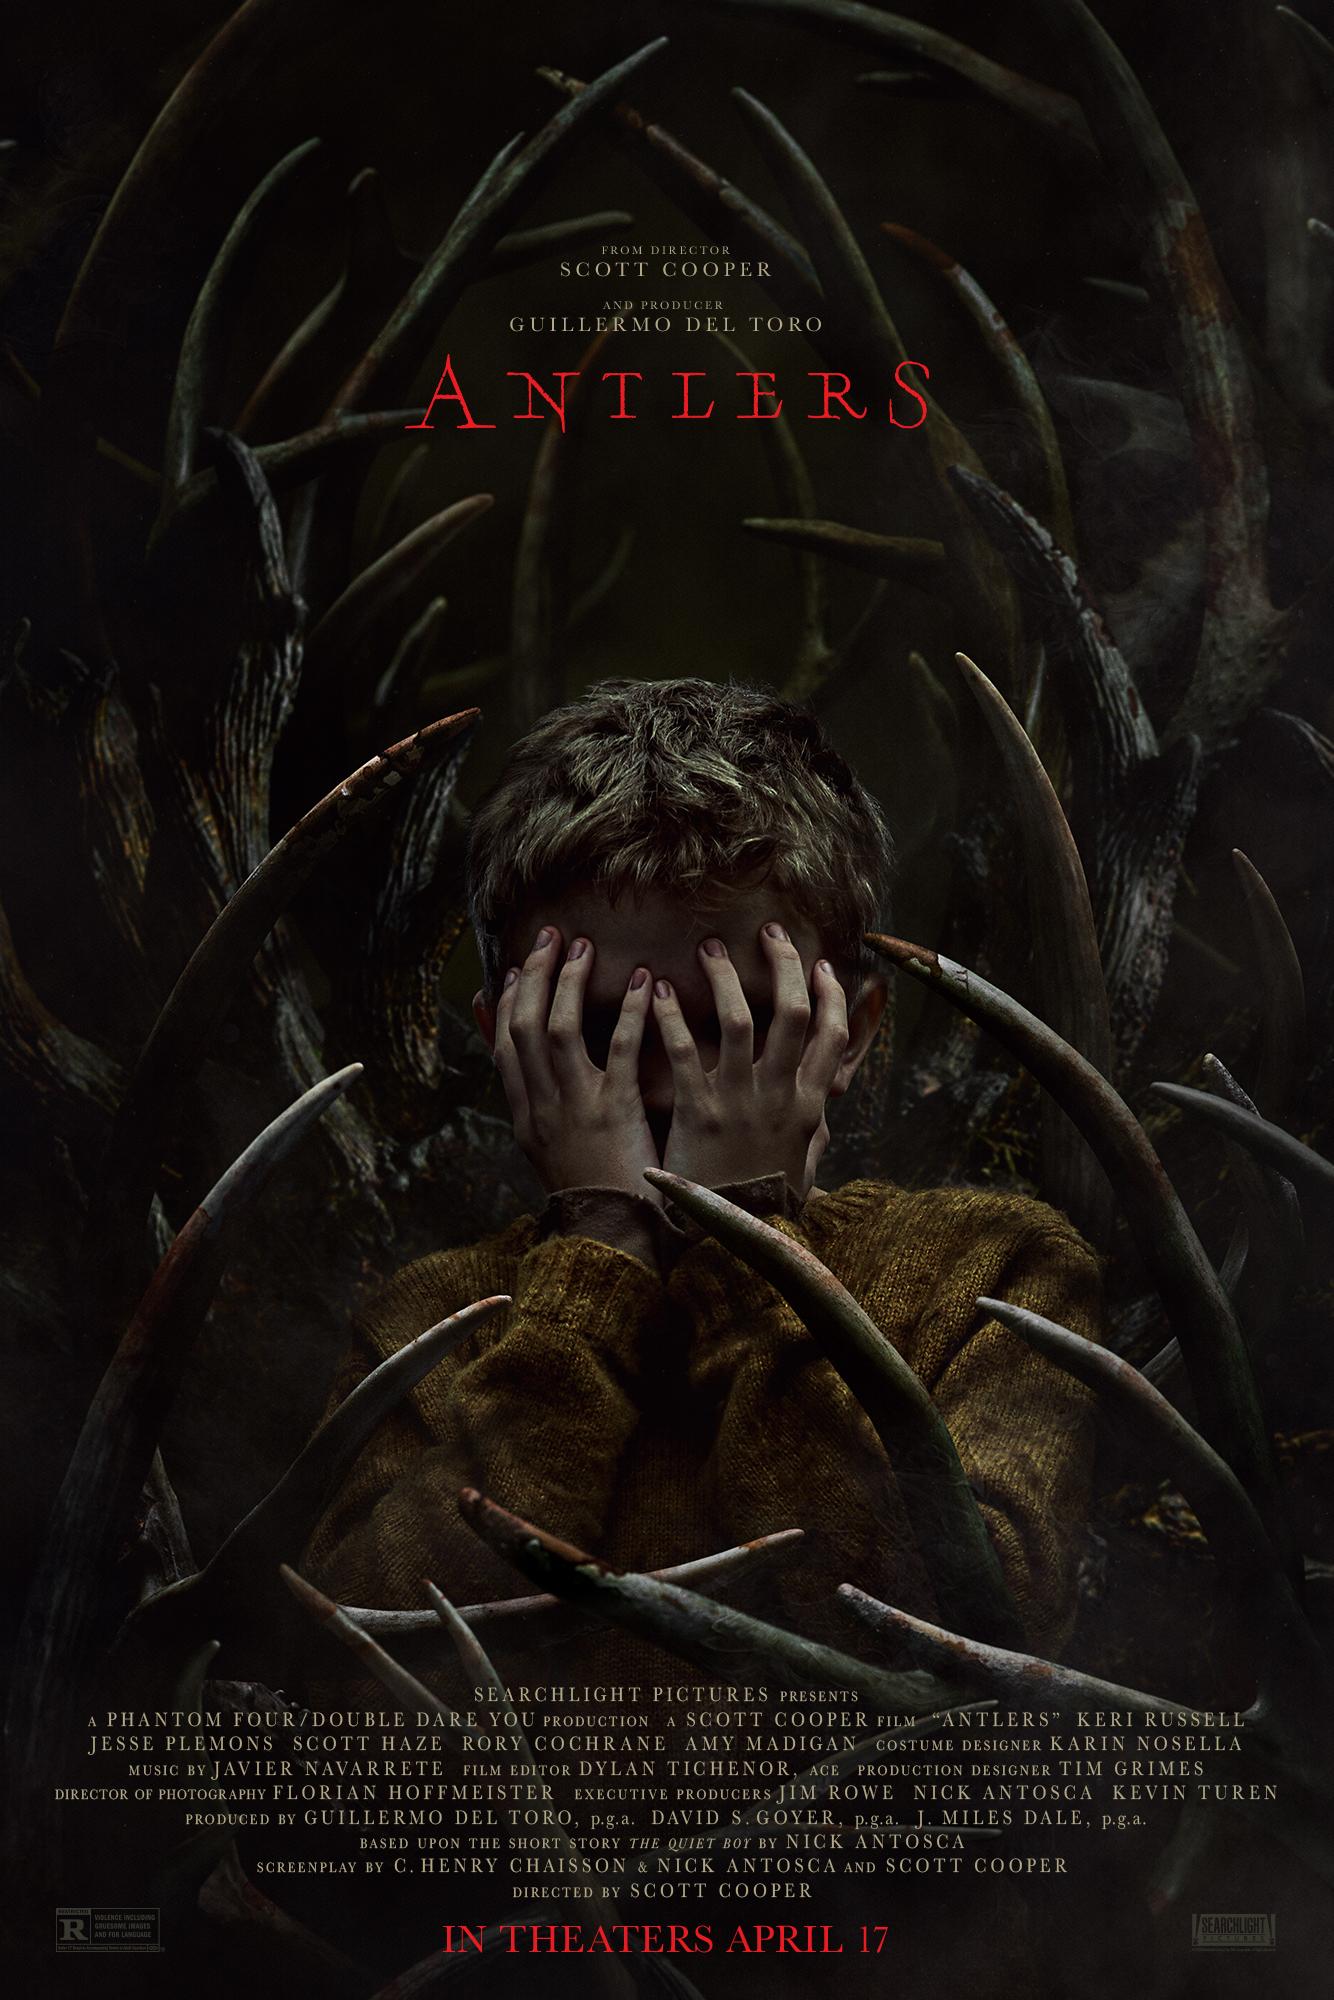 NEPASOTINAMAS ALKIS (Antlers)